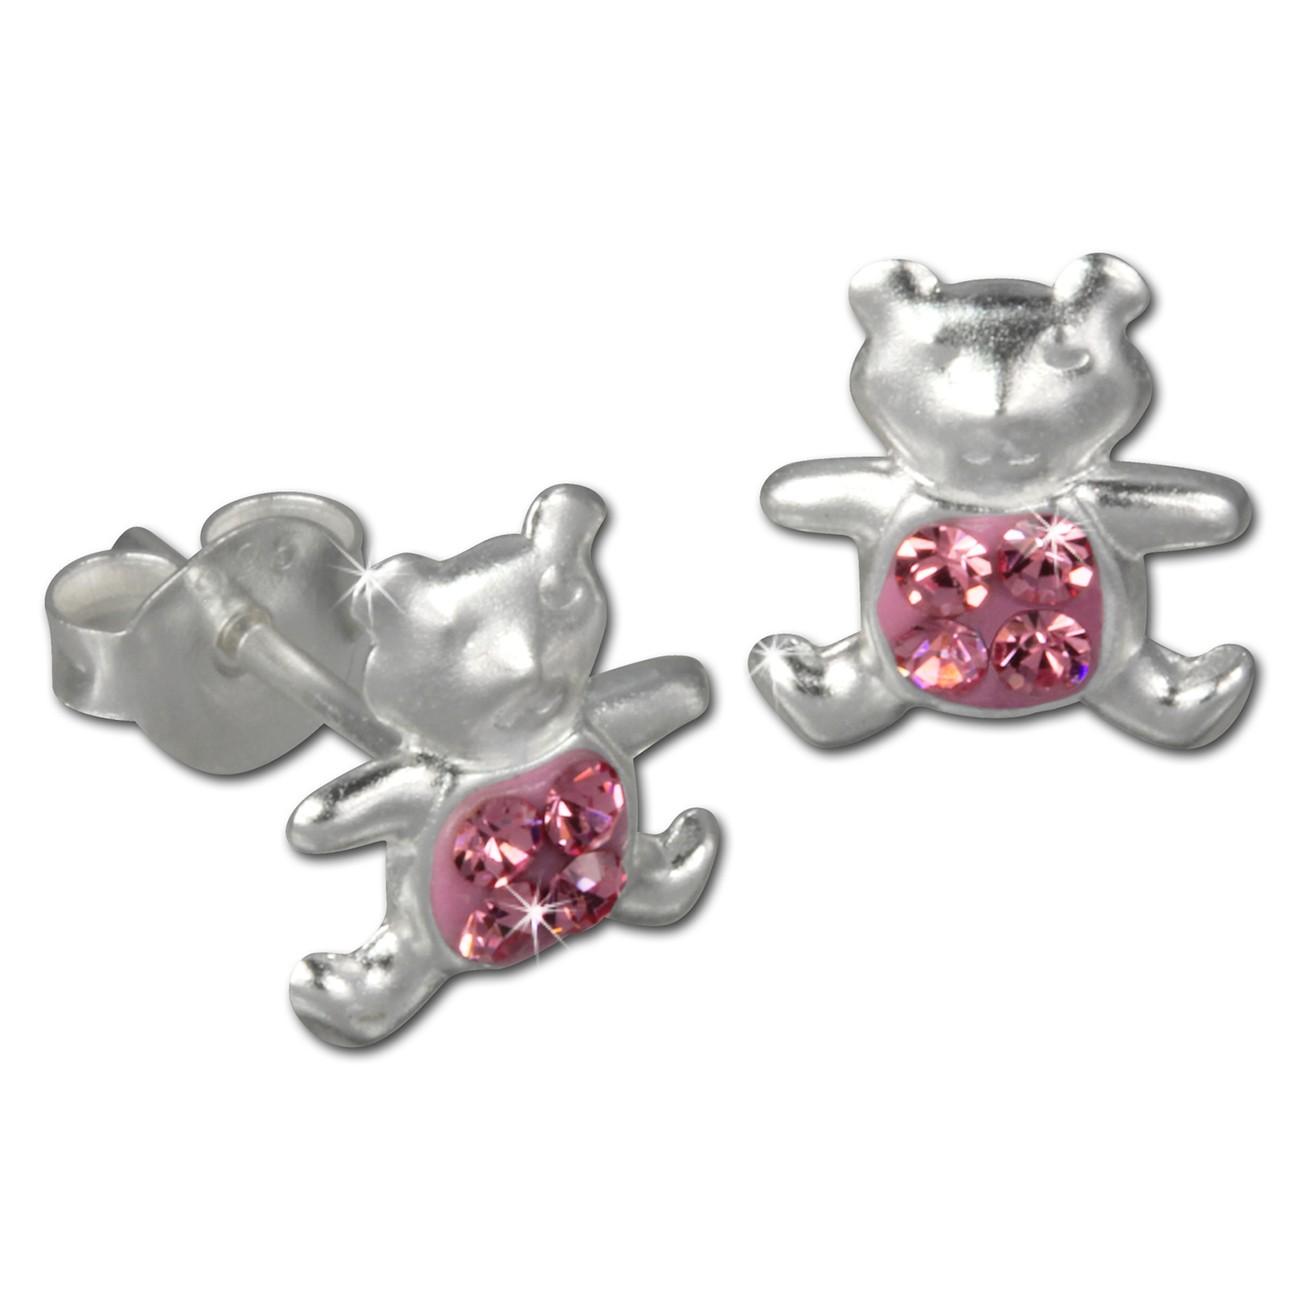 Kinder Ohrring Teddy rosa Silber Ohrstecker Kinderschmuck TW SDO8007A